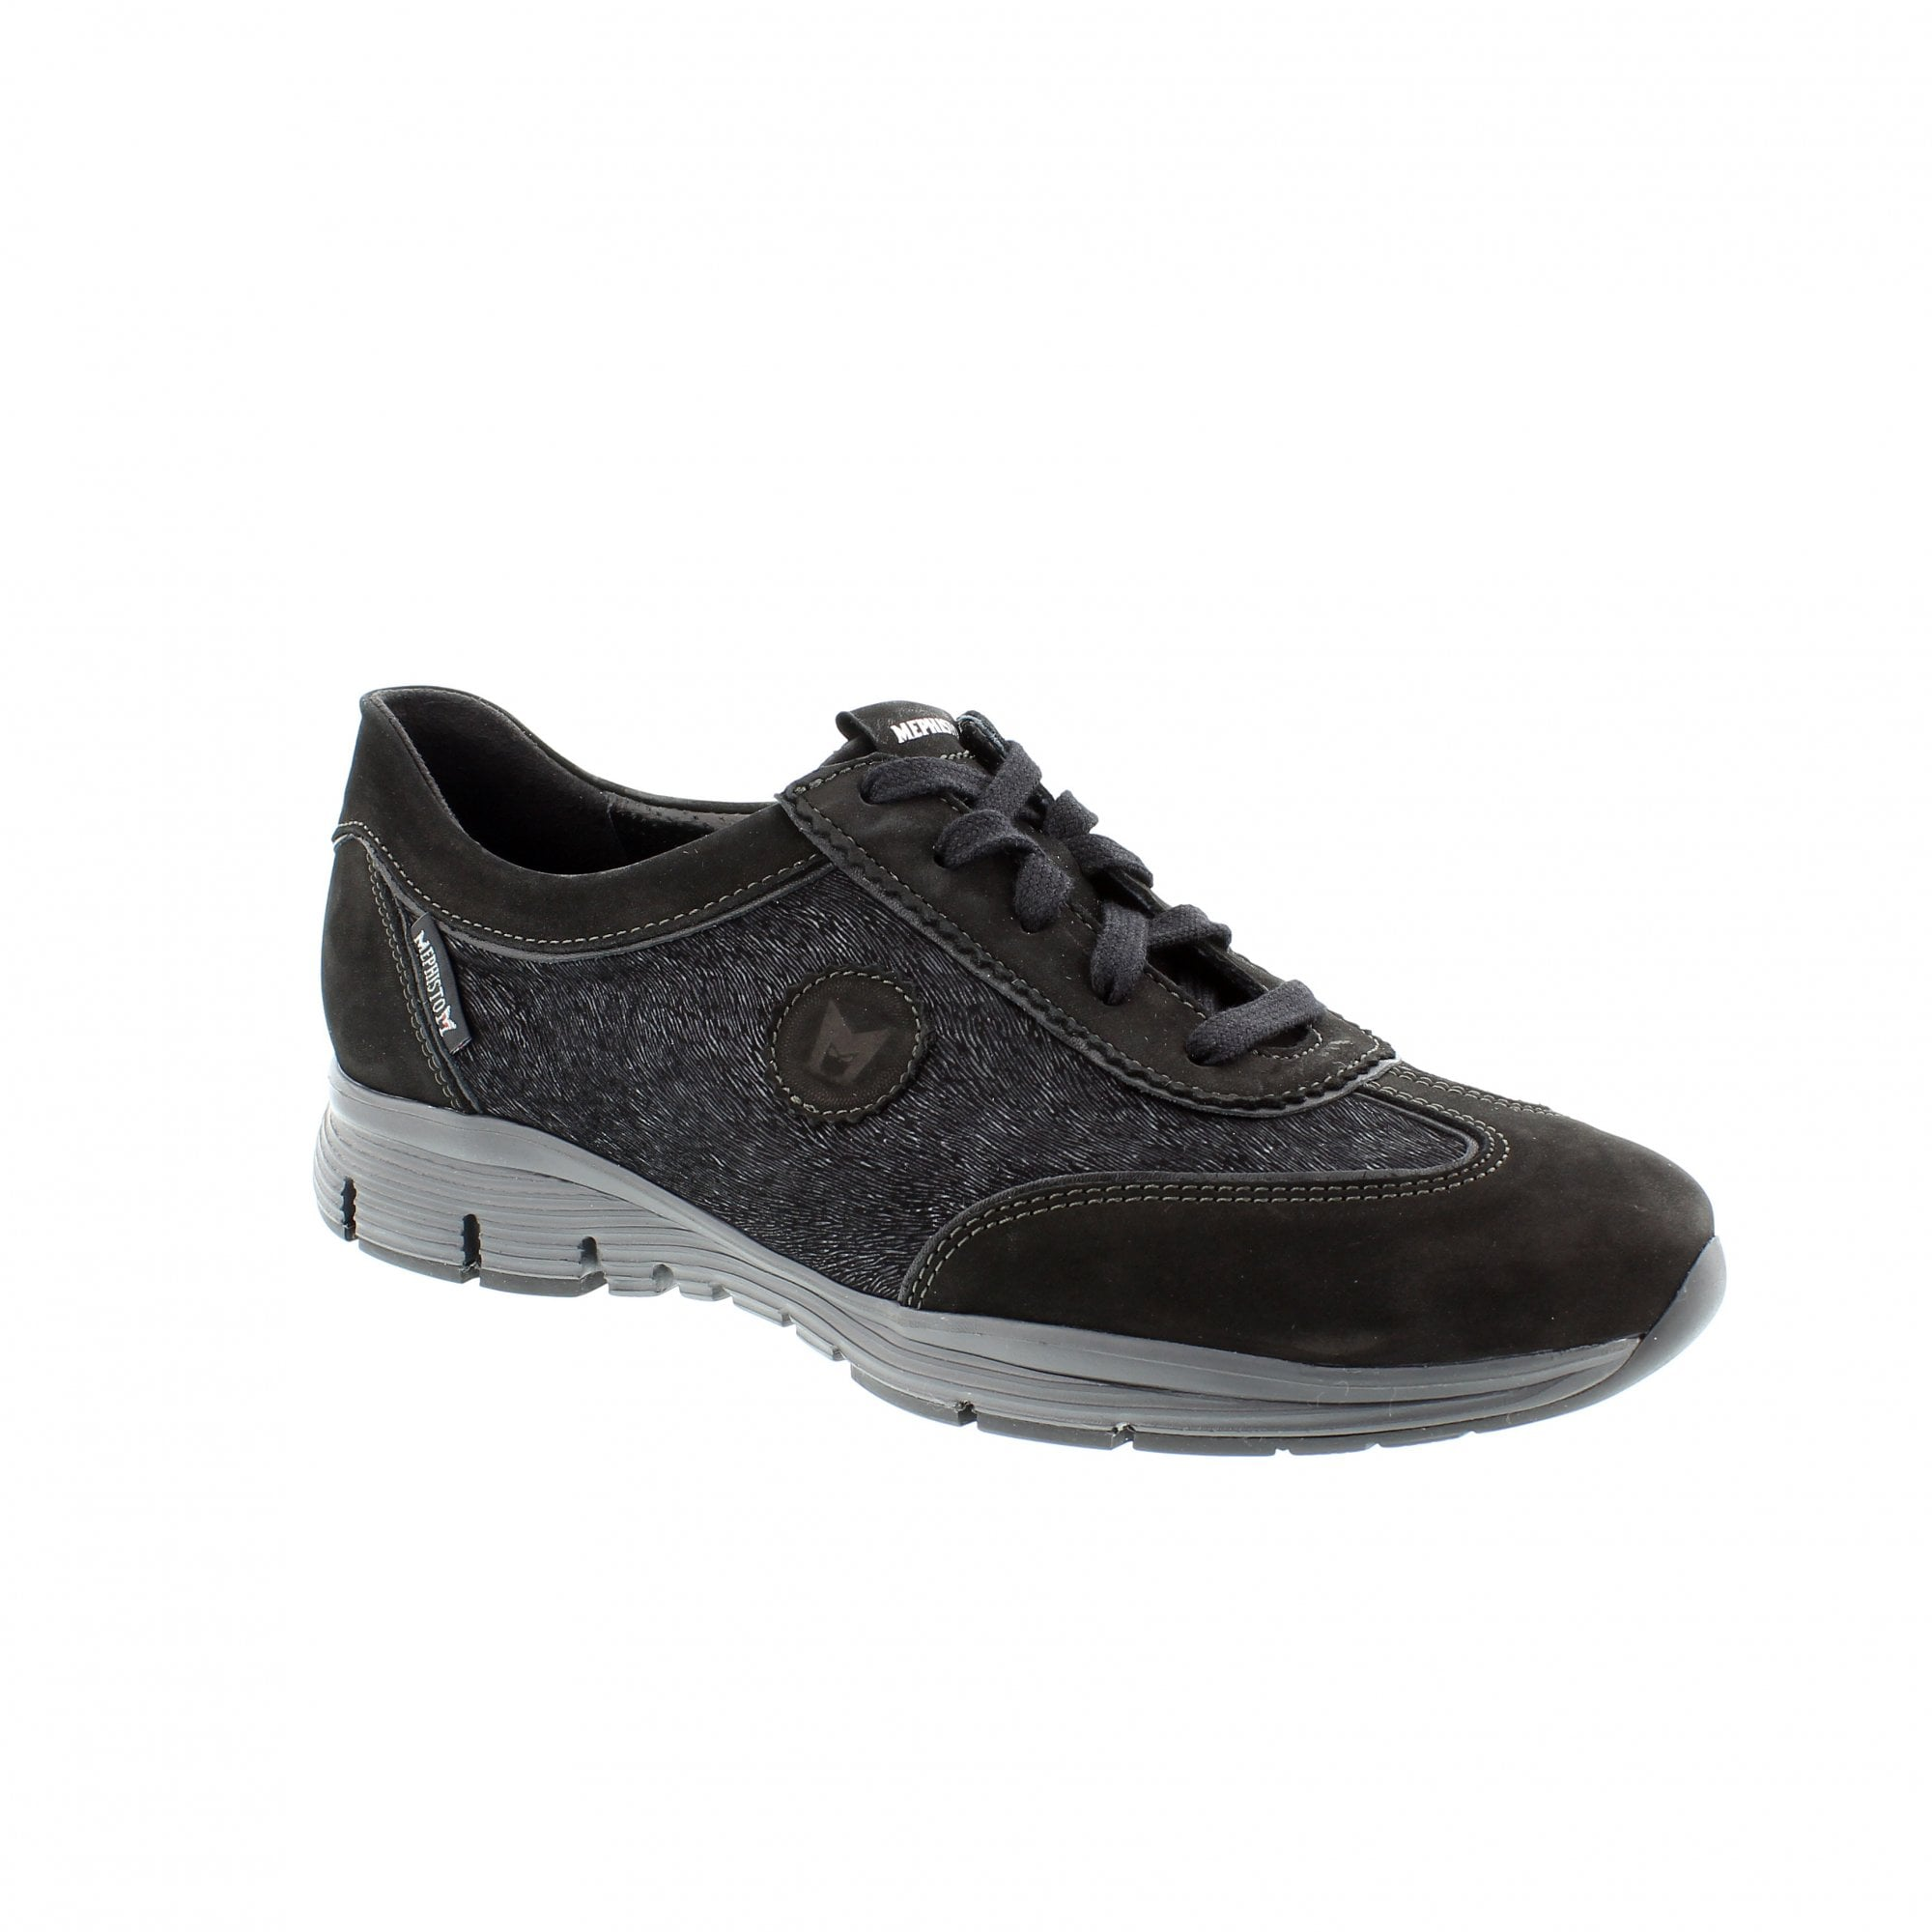 871f2b0205 Mephisto Yael 6900/17600/10100 Womens Trainers | Rogerson Shoes